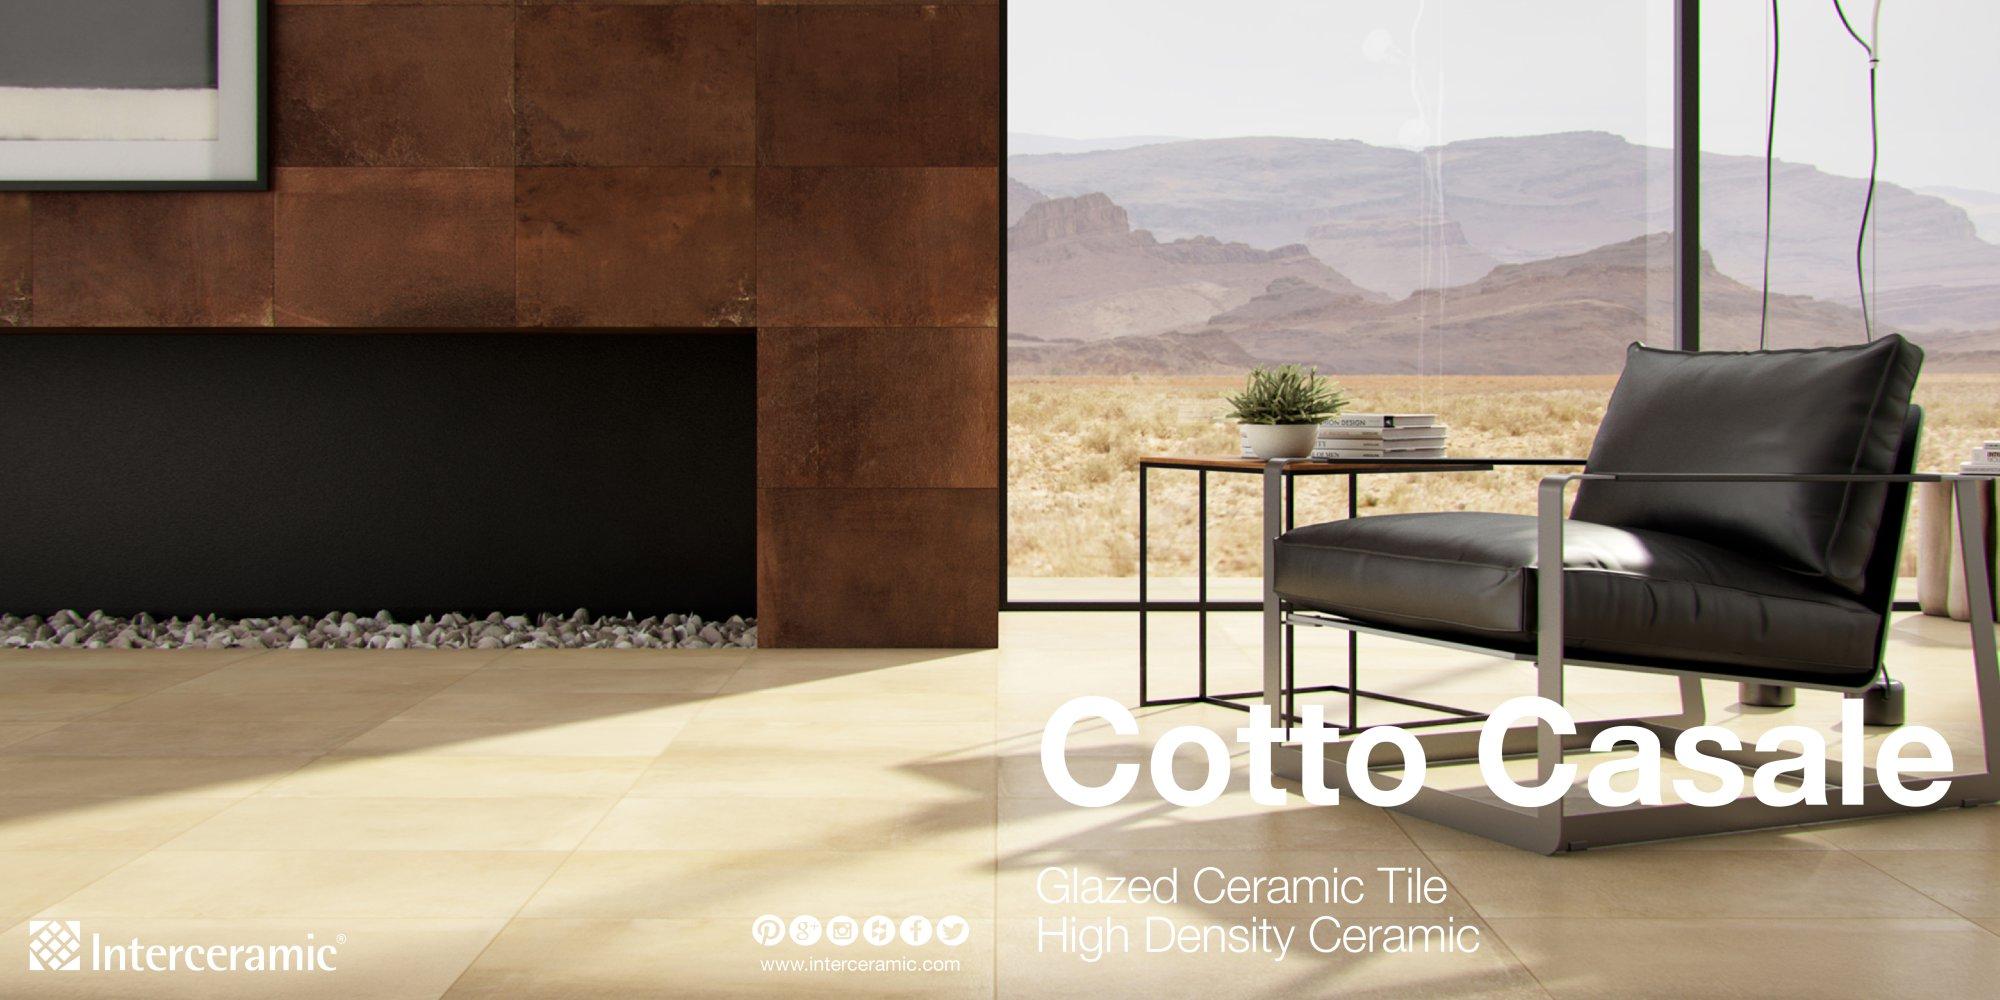 Cotto Casale Interceramic Pdf Catalogues Documentation Brochures